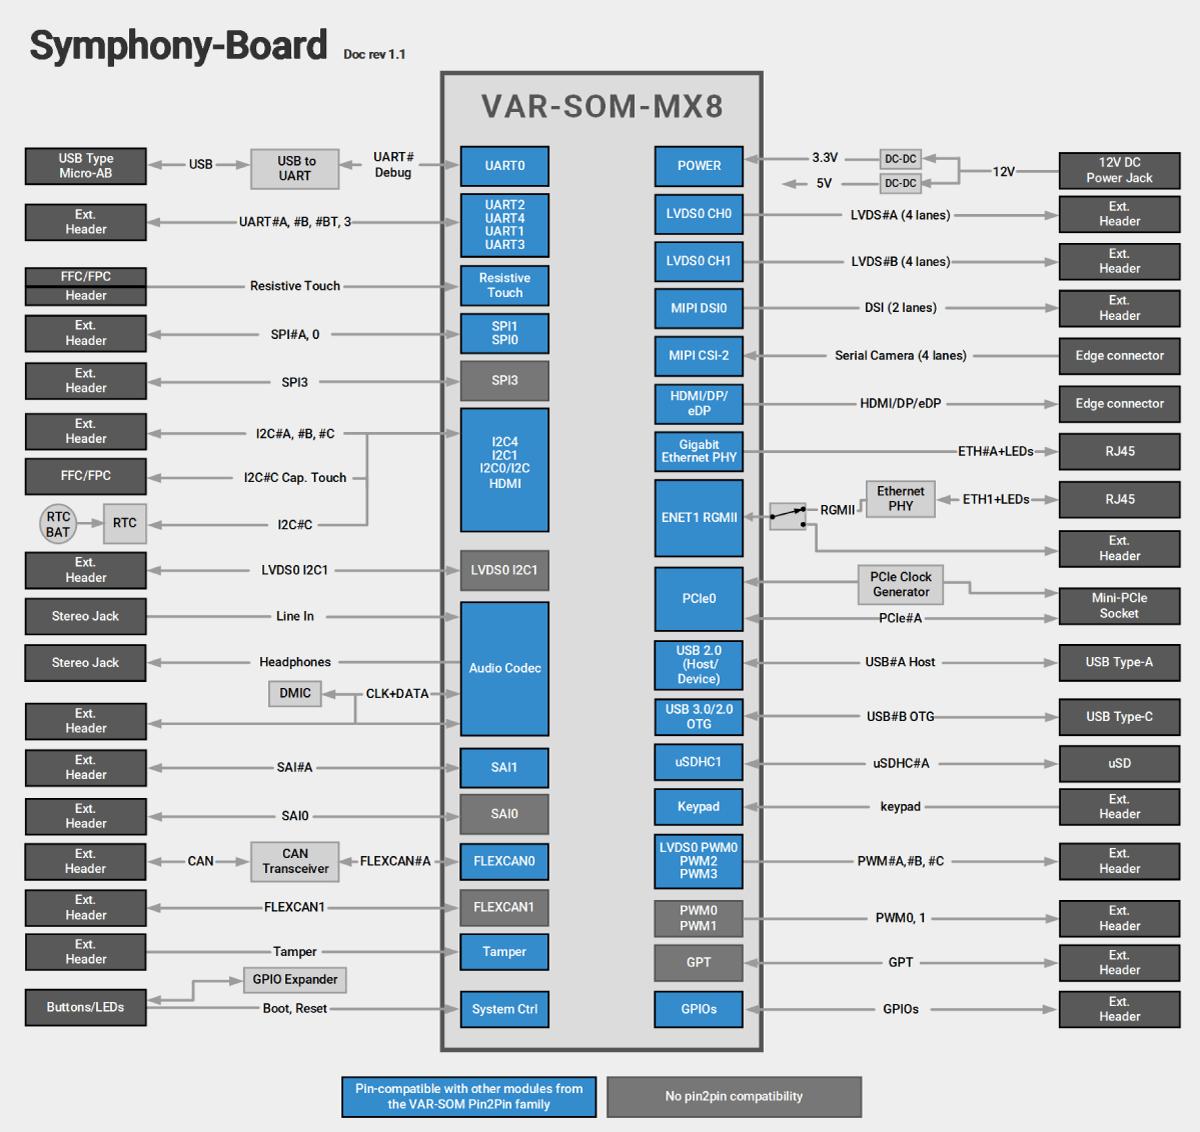 Symphony-Board With VAR-SOM-MX8 Block Diagram Diagram